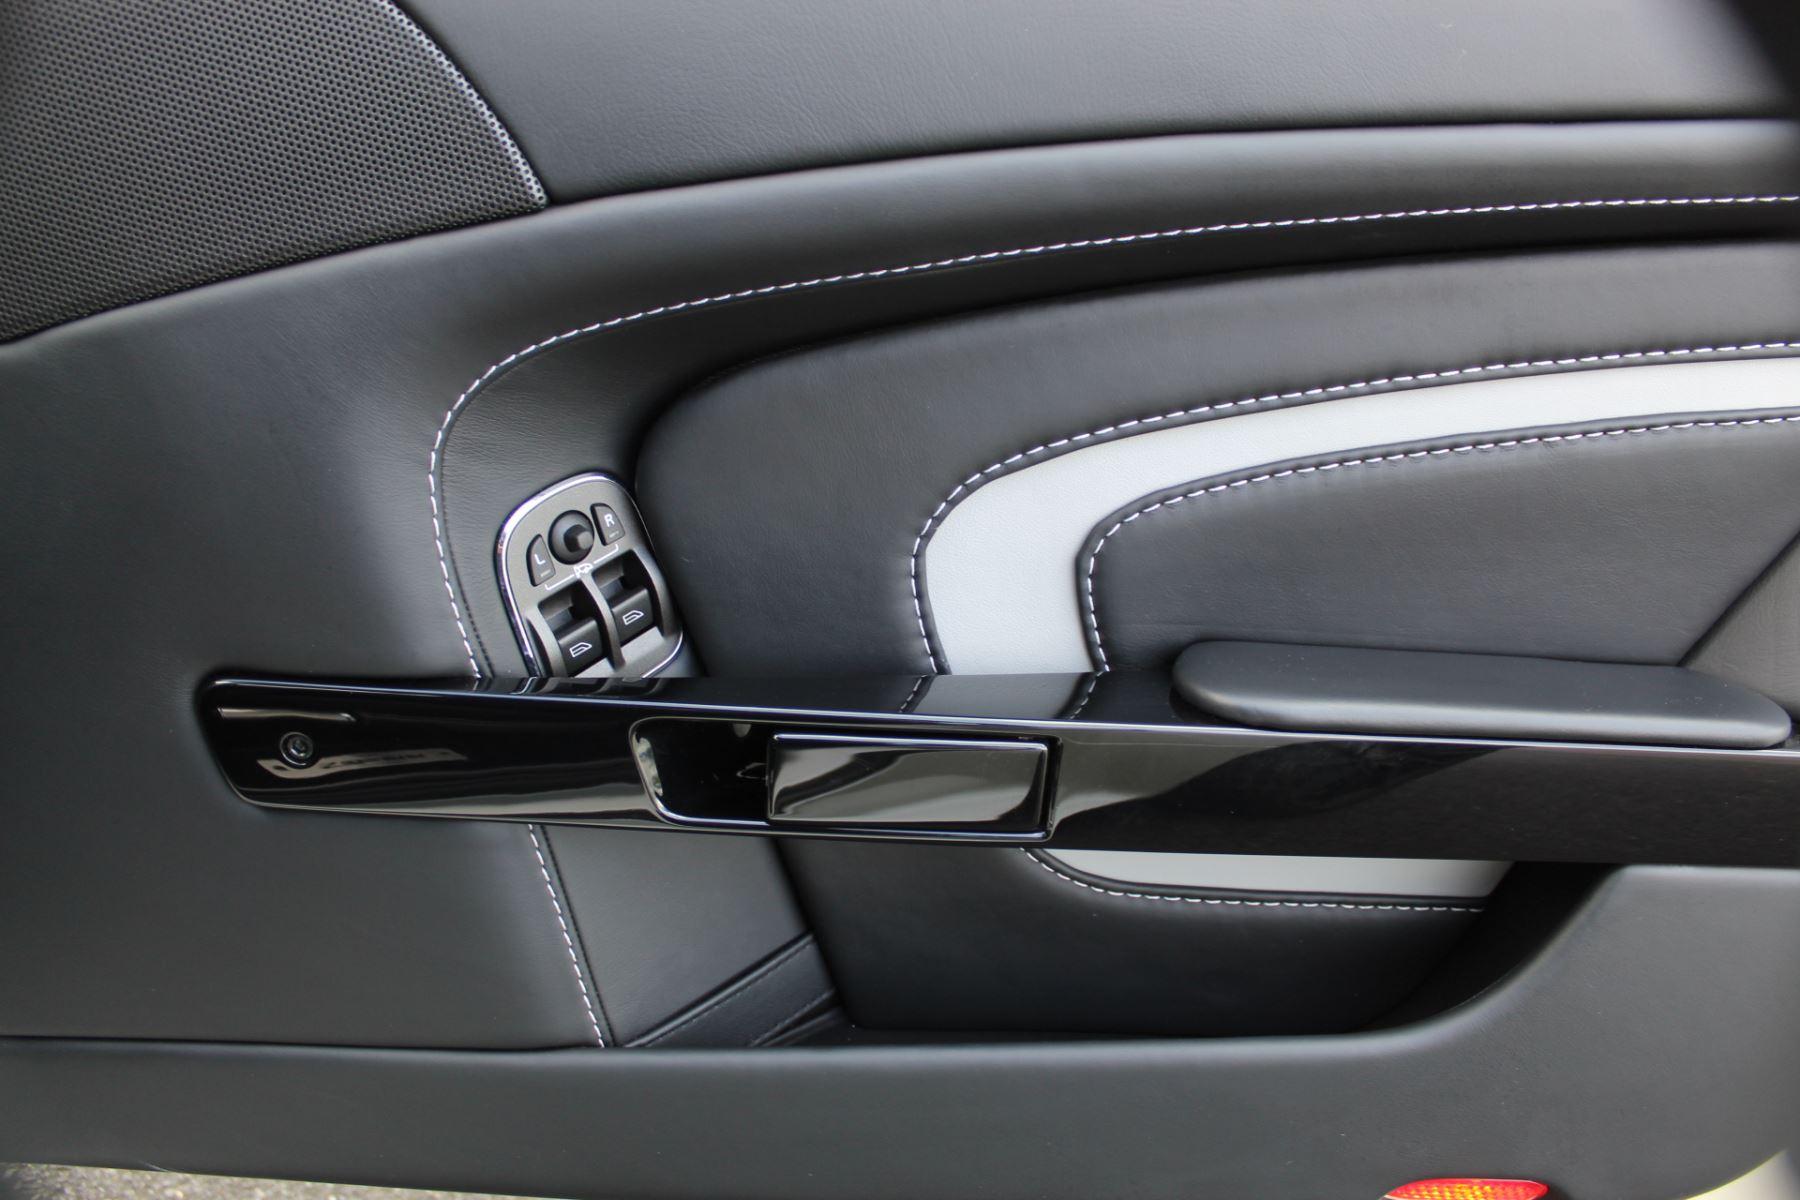 Aston Martin V12 Vantage S Coupe S 2dr Sportshift III image 16